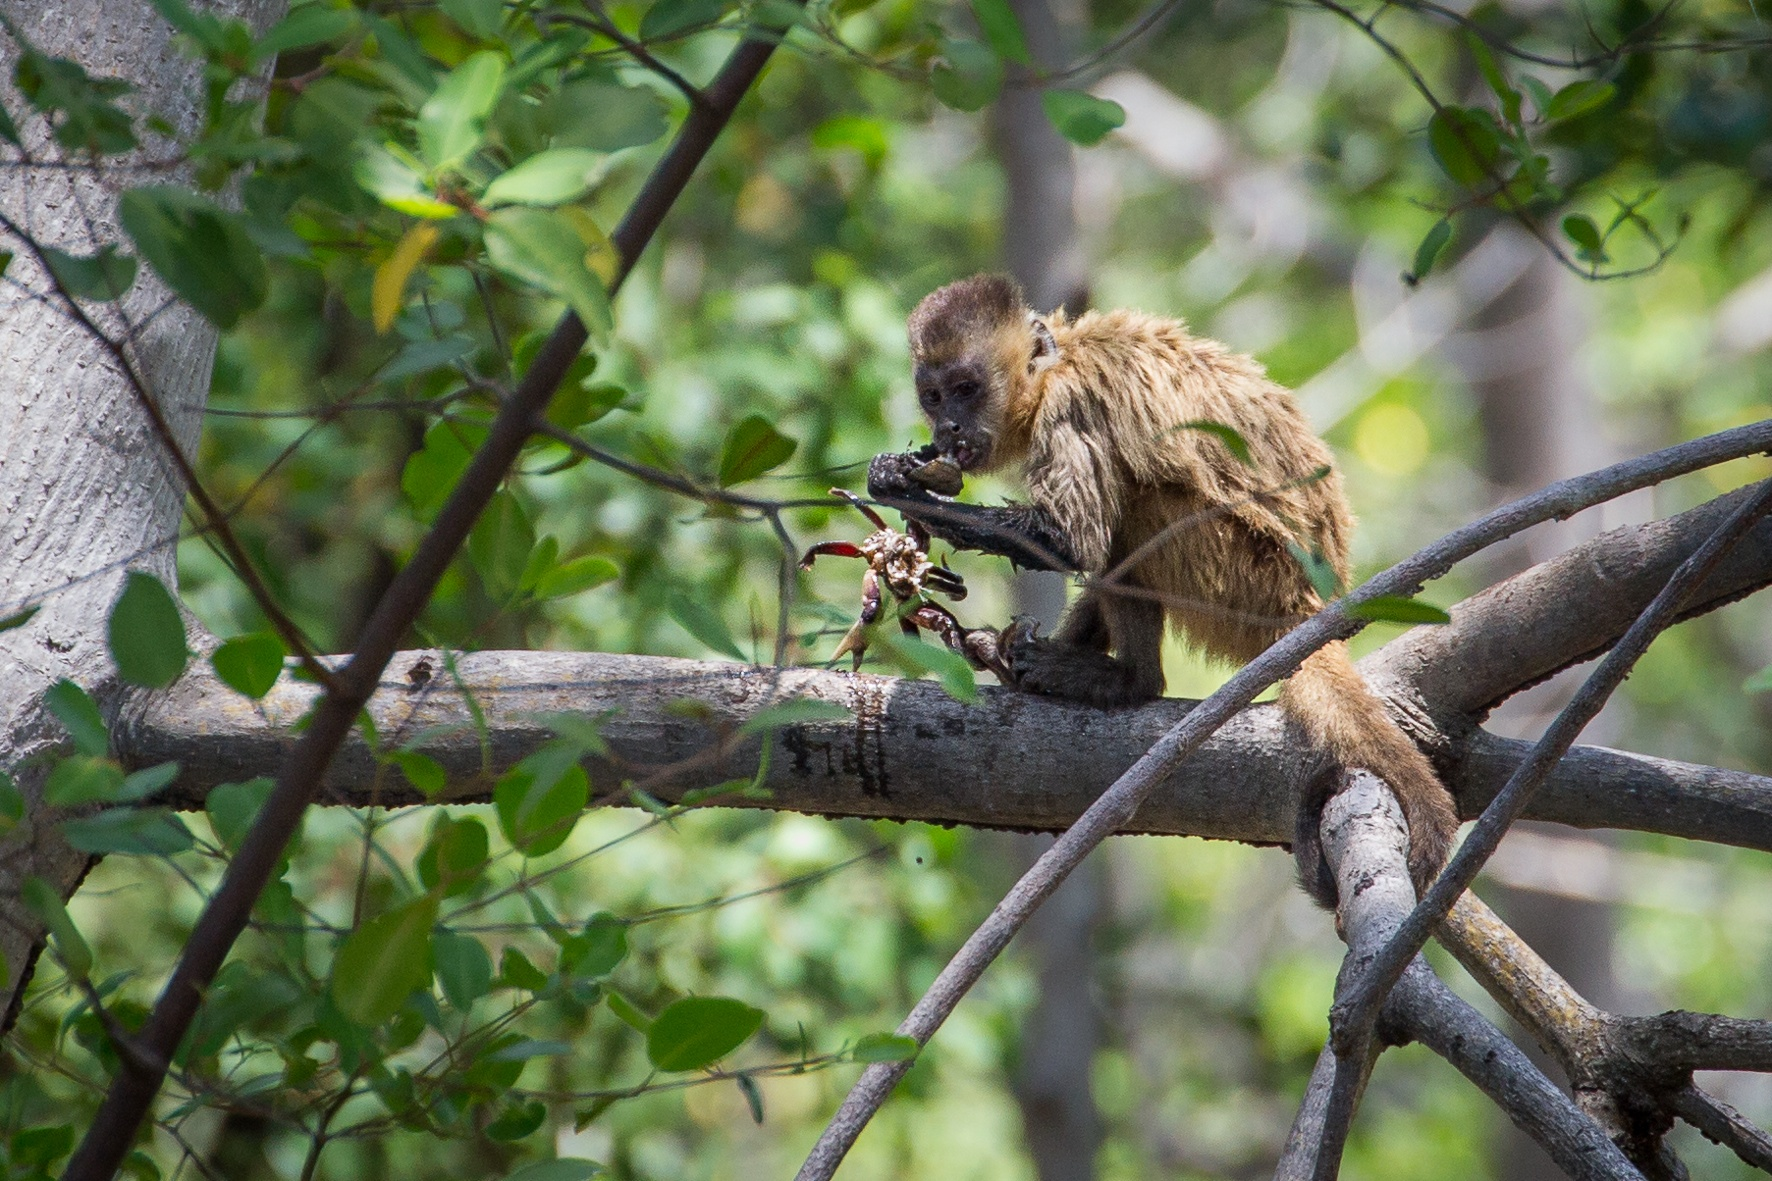 Beardy Monkey: File:Bearded Capuchin Monkey (Cebus Libidinosus) Crab.jpg